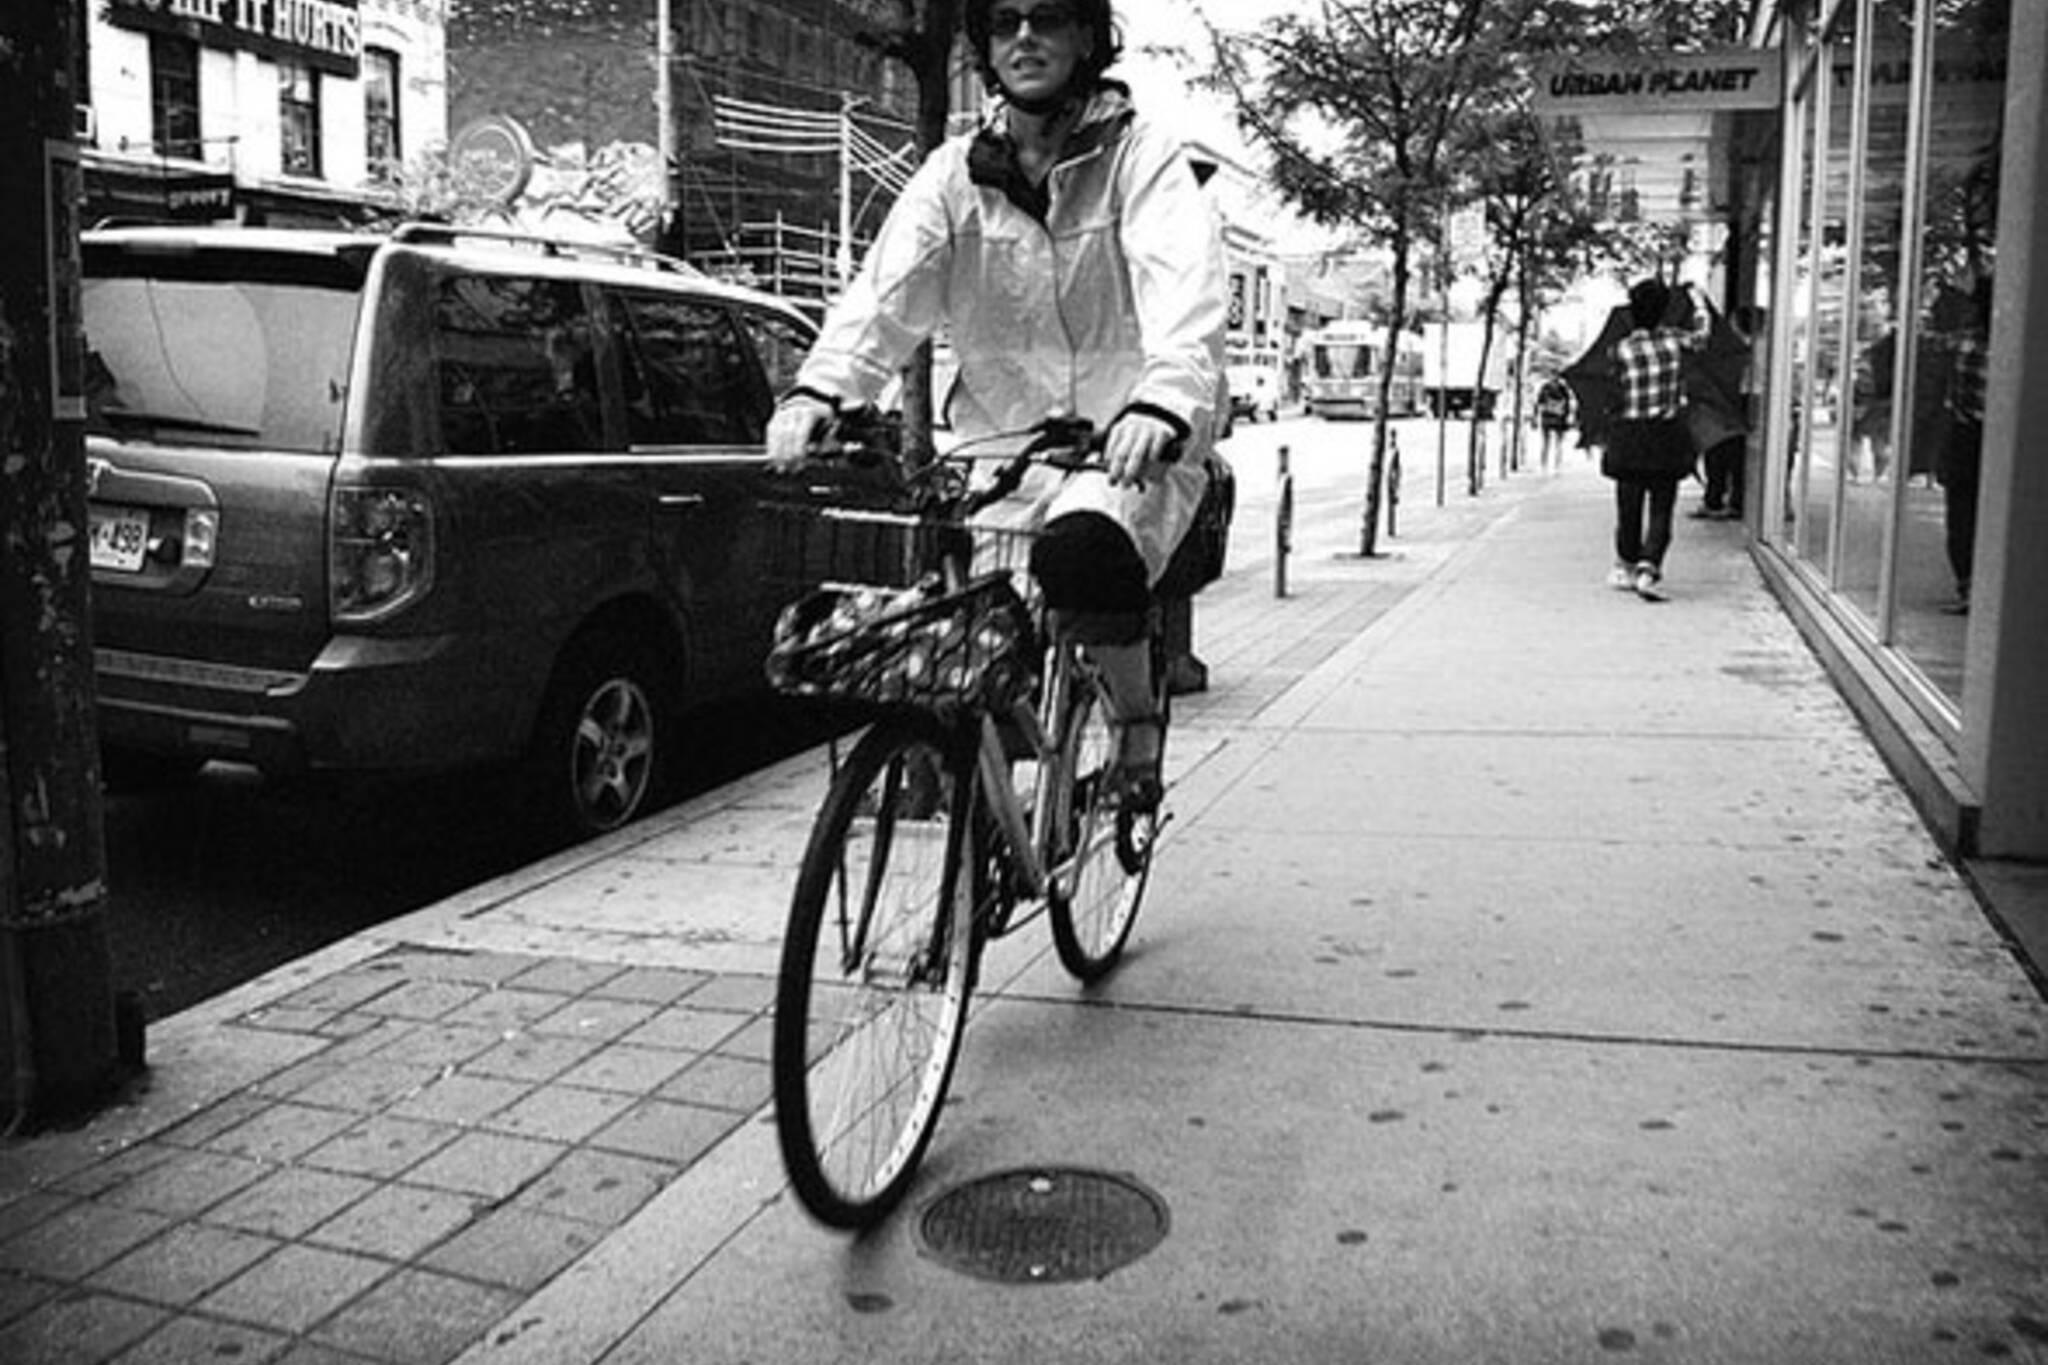 toronto cyclist riding on the sidewalk